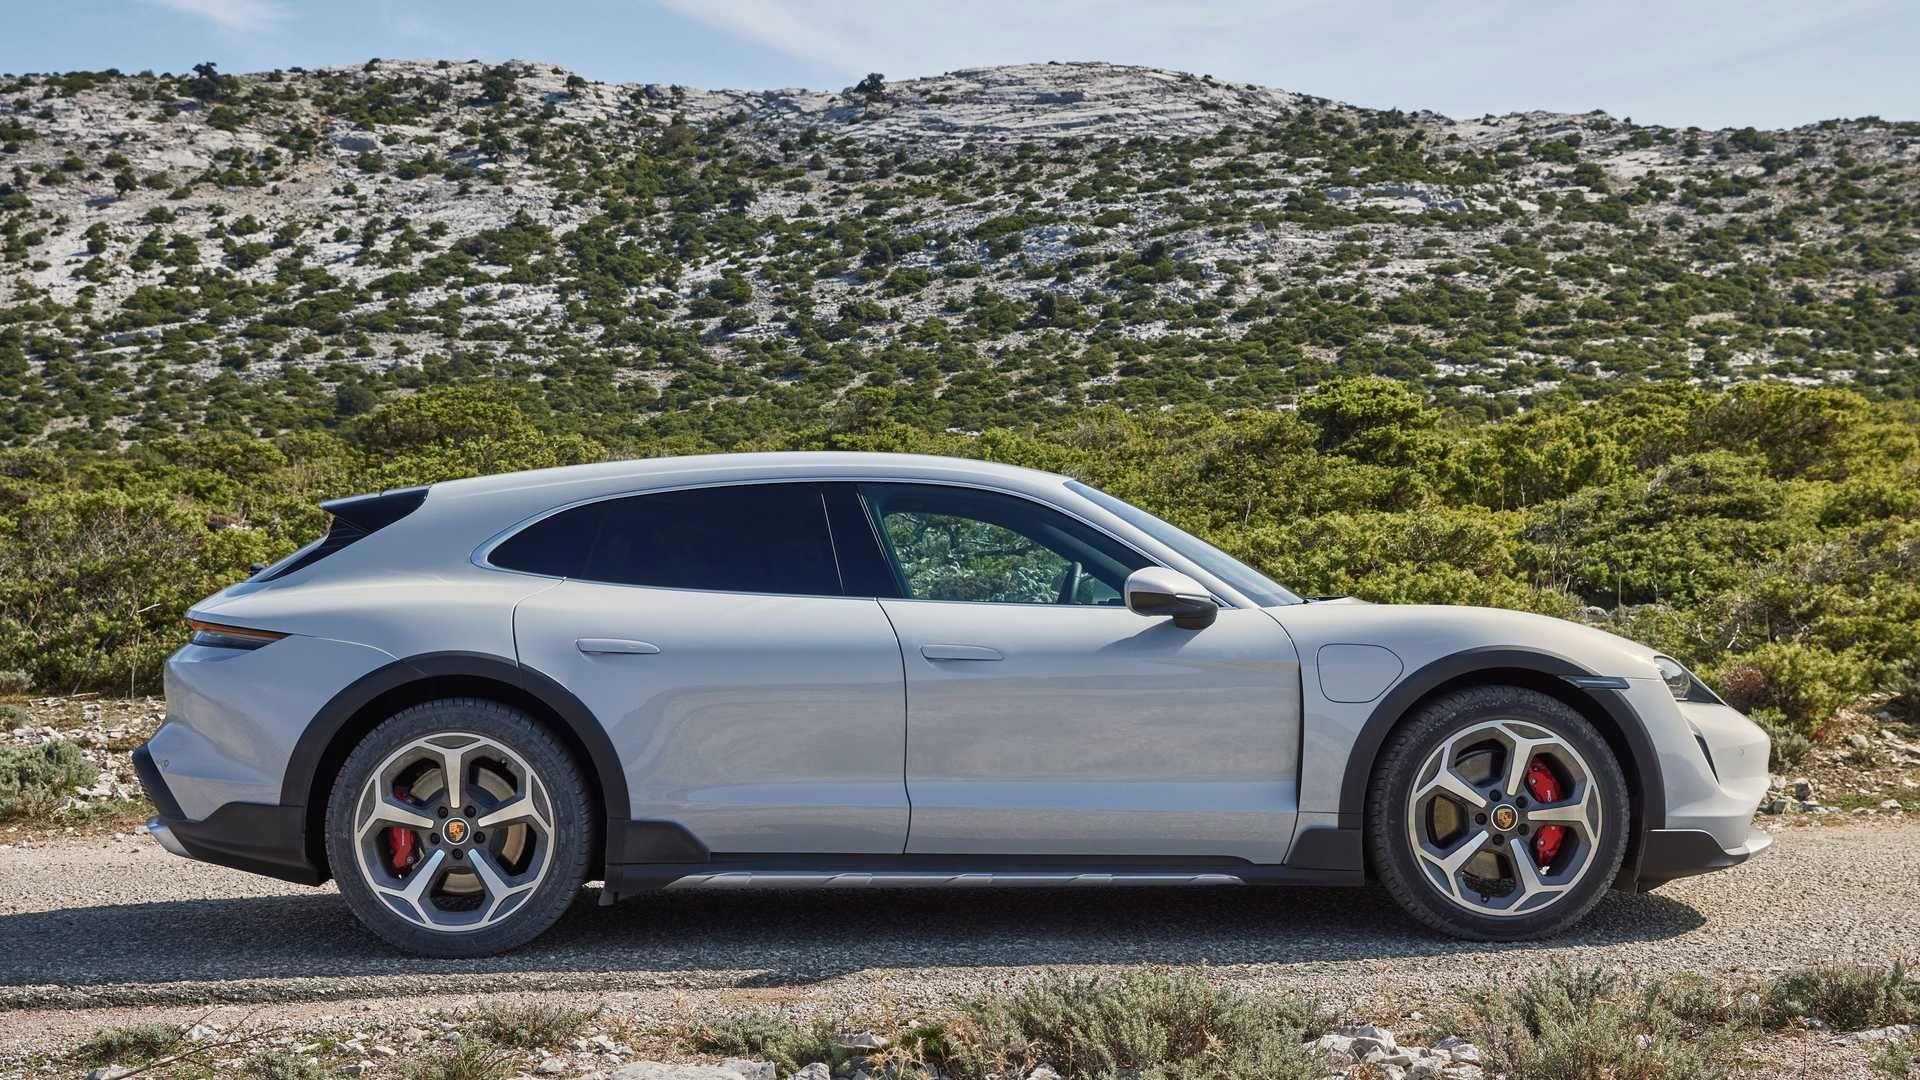 Porsche-Taycan-Cross-Turismo-17